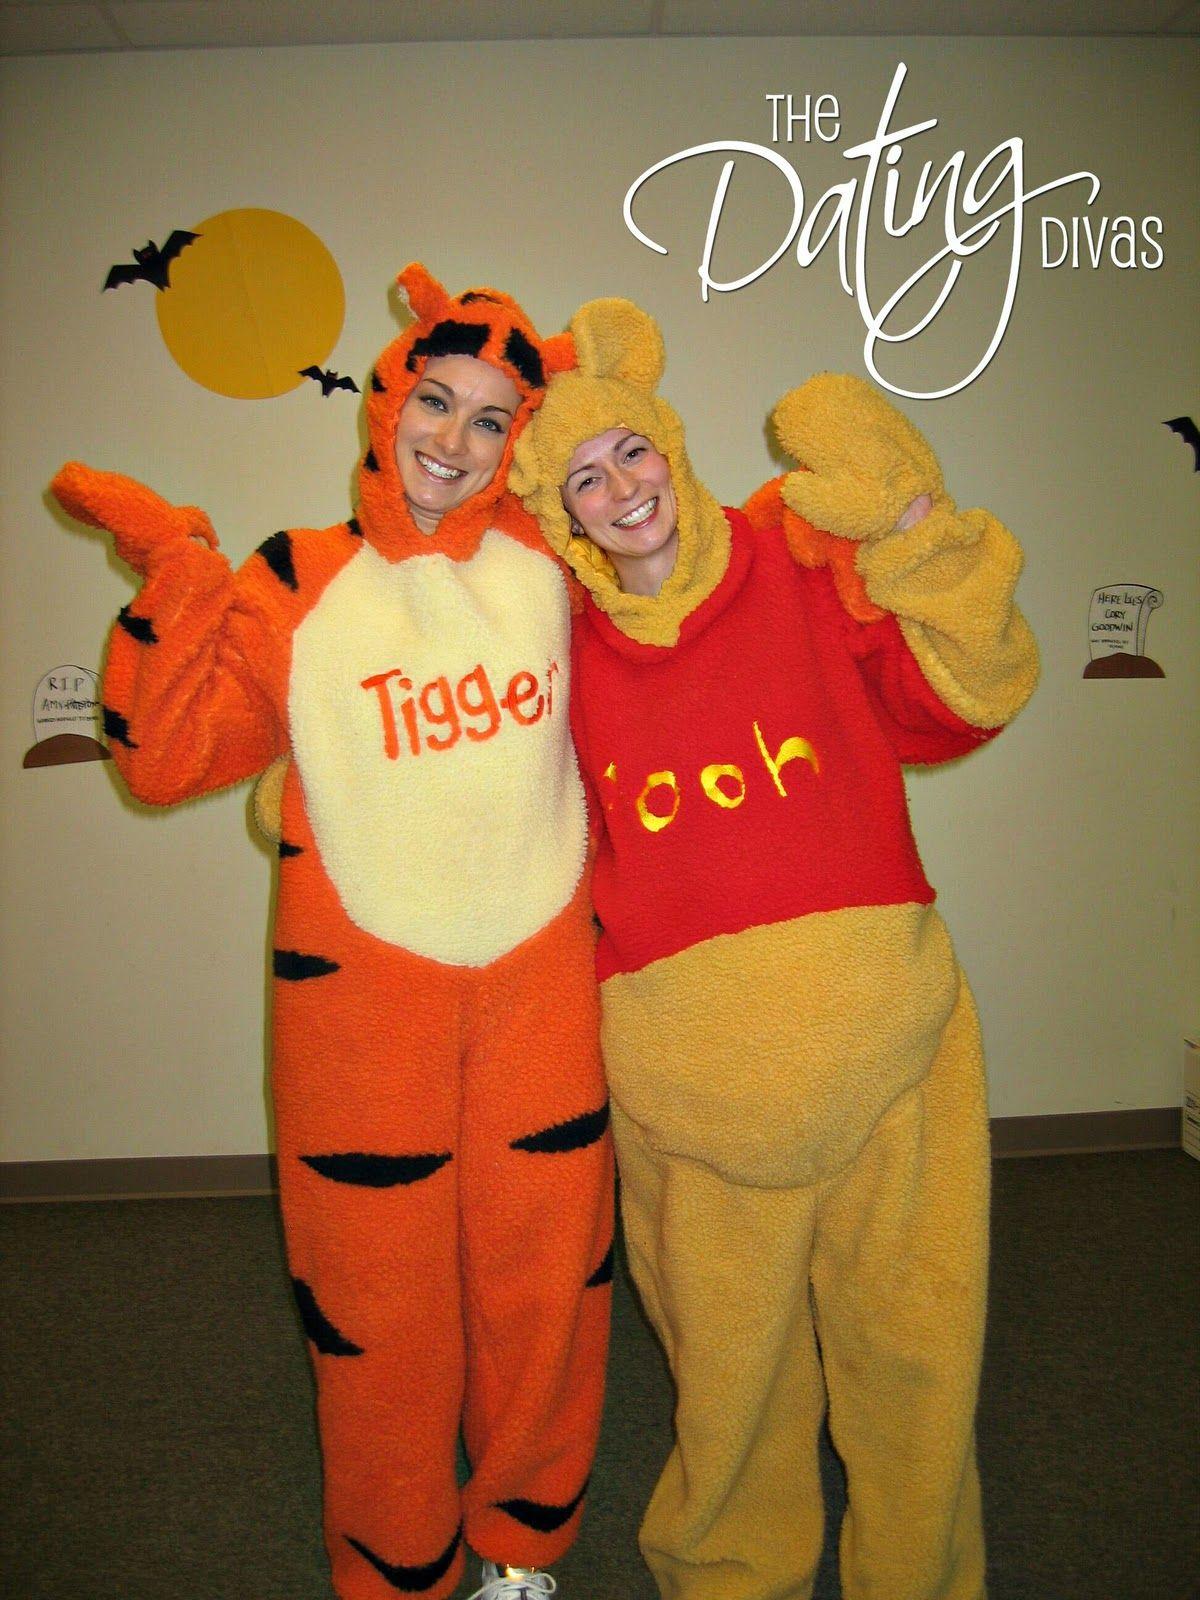 99ed9d4d62c2 Pooh and tigger. Erika - Couples Halloween Costume 9